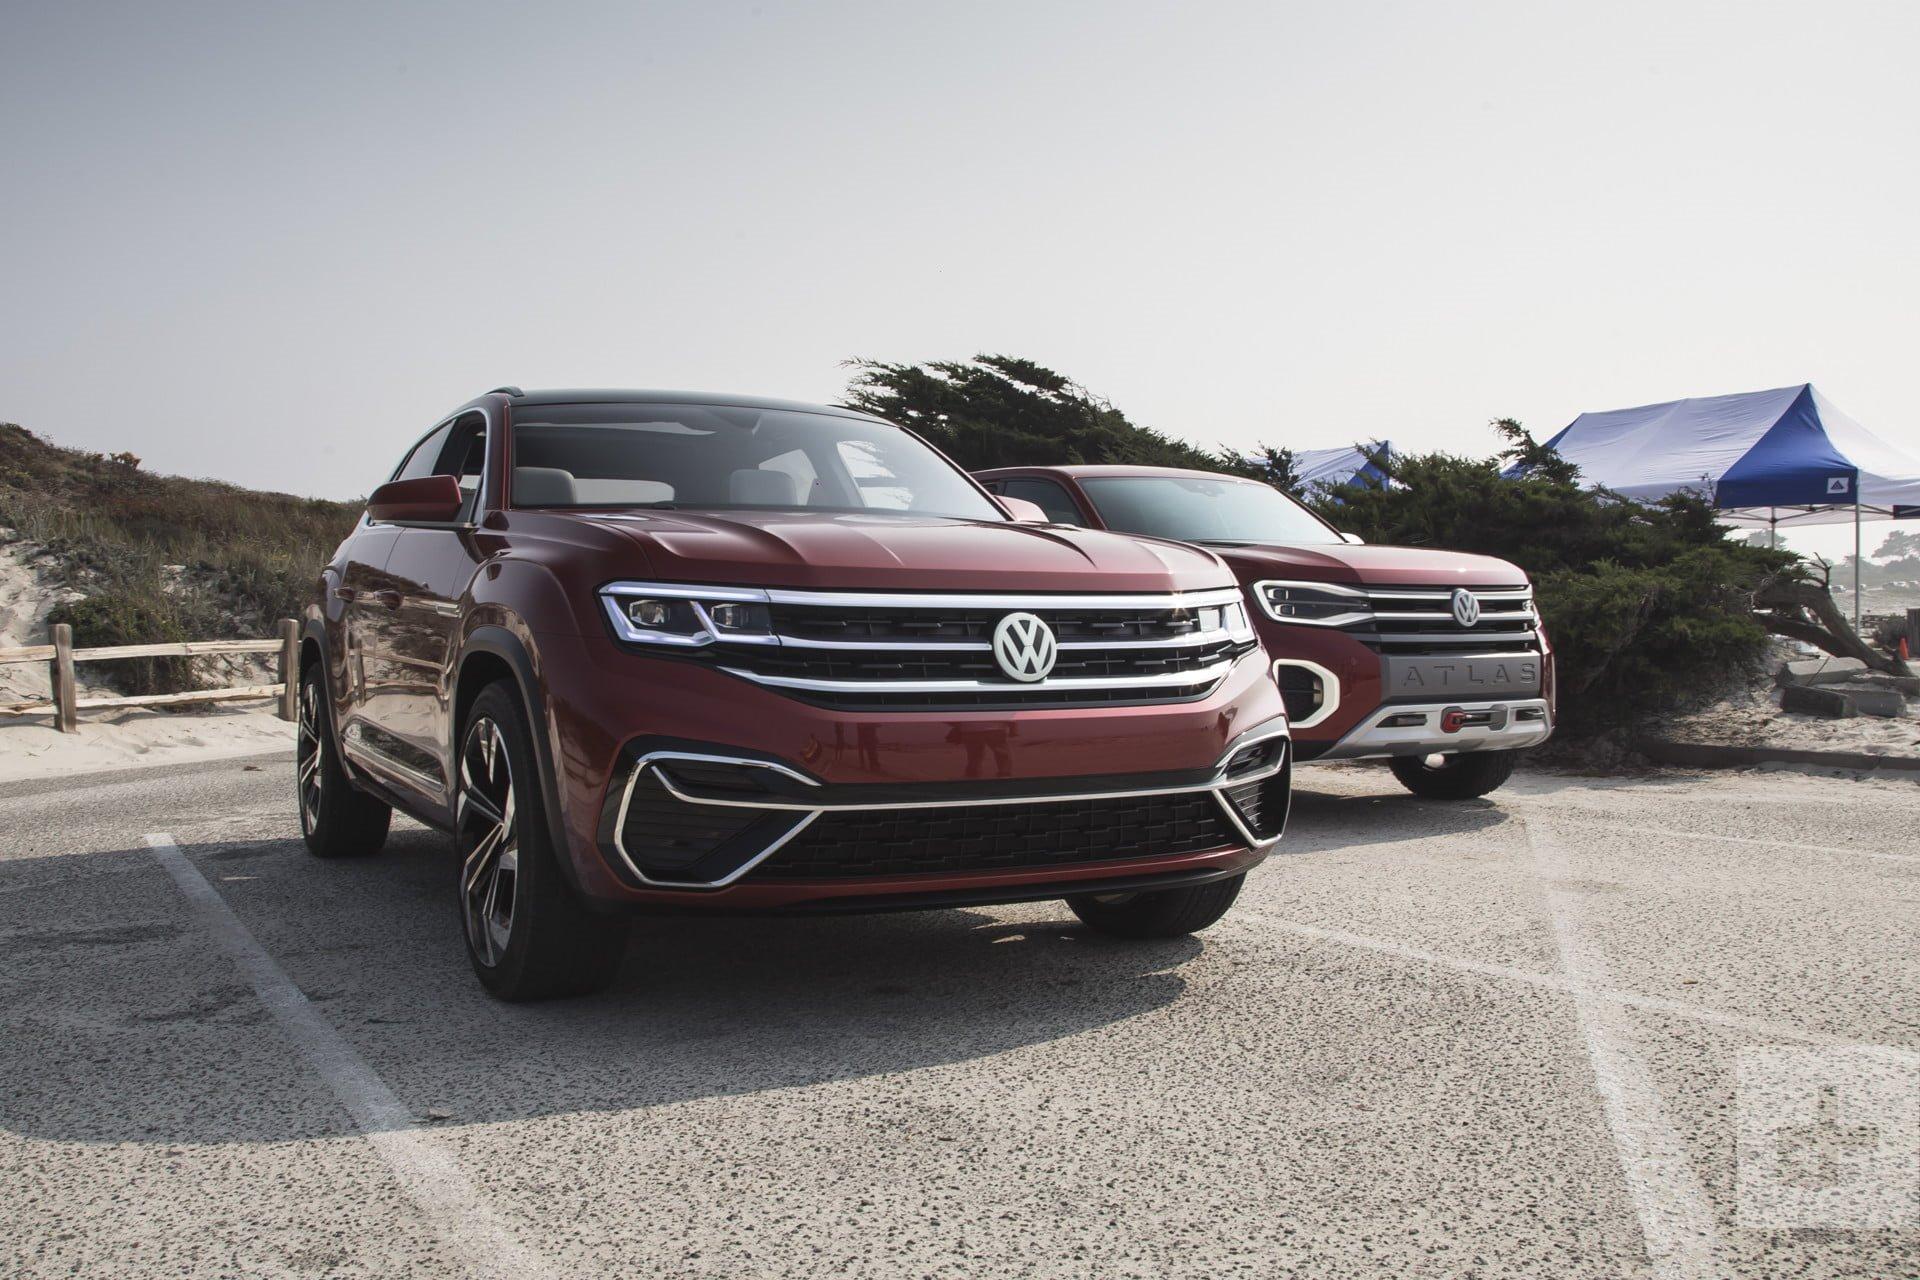 New 2019 Volkswagen-Atlas V6 SE 4Motion Atlas V6 SE 4Motion for sale $39,095 at M and V Leasing in Brooklyn NY 11223 1